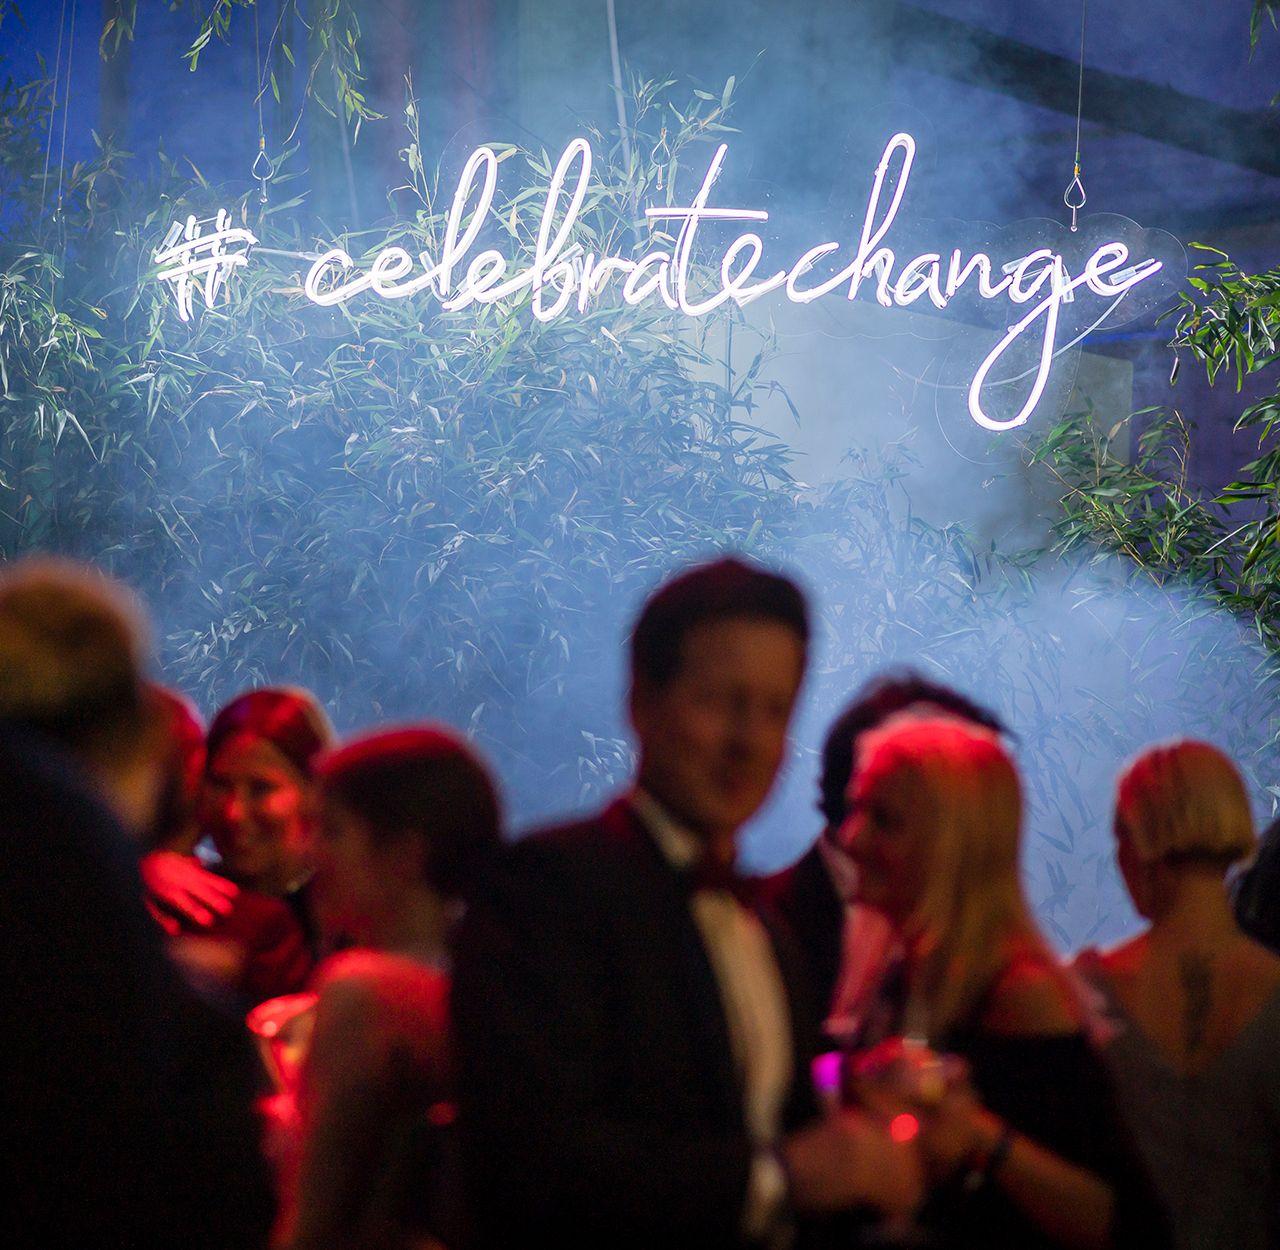 Greentech Festival celebrate change